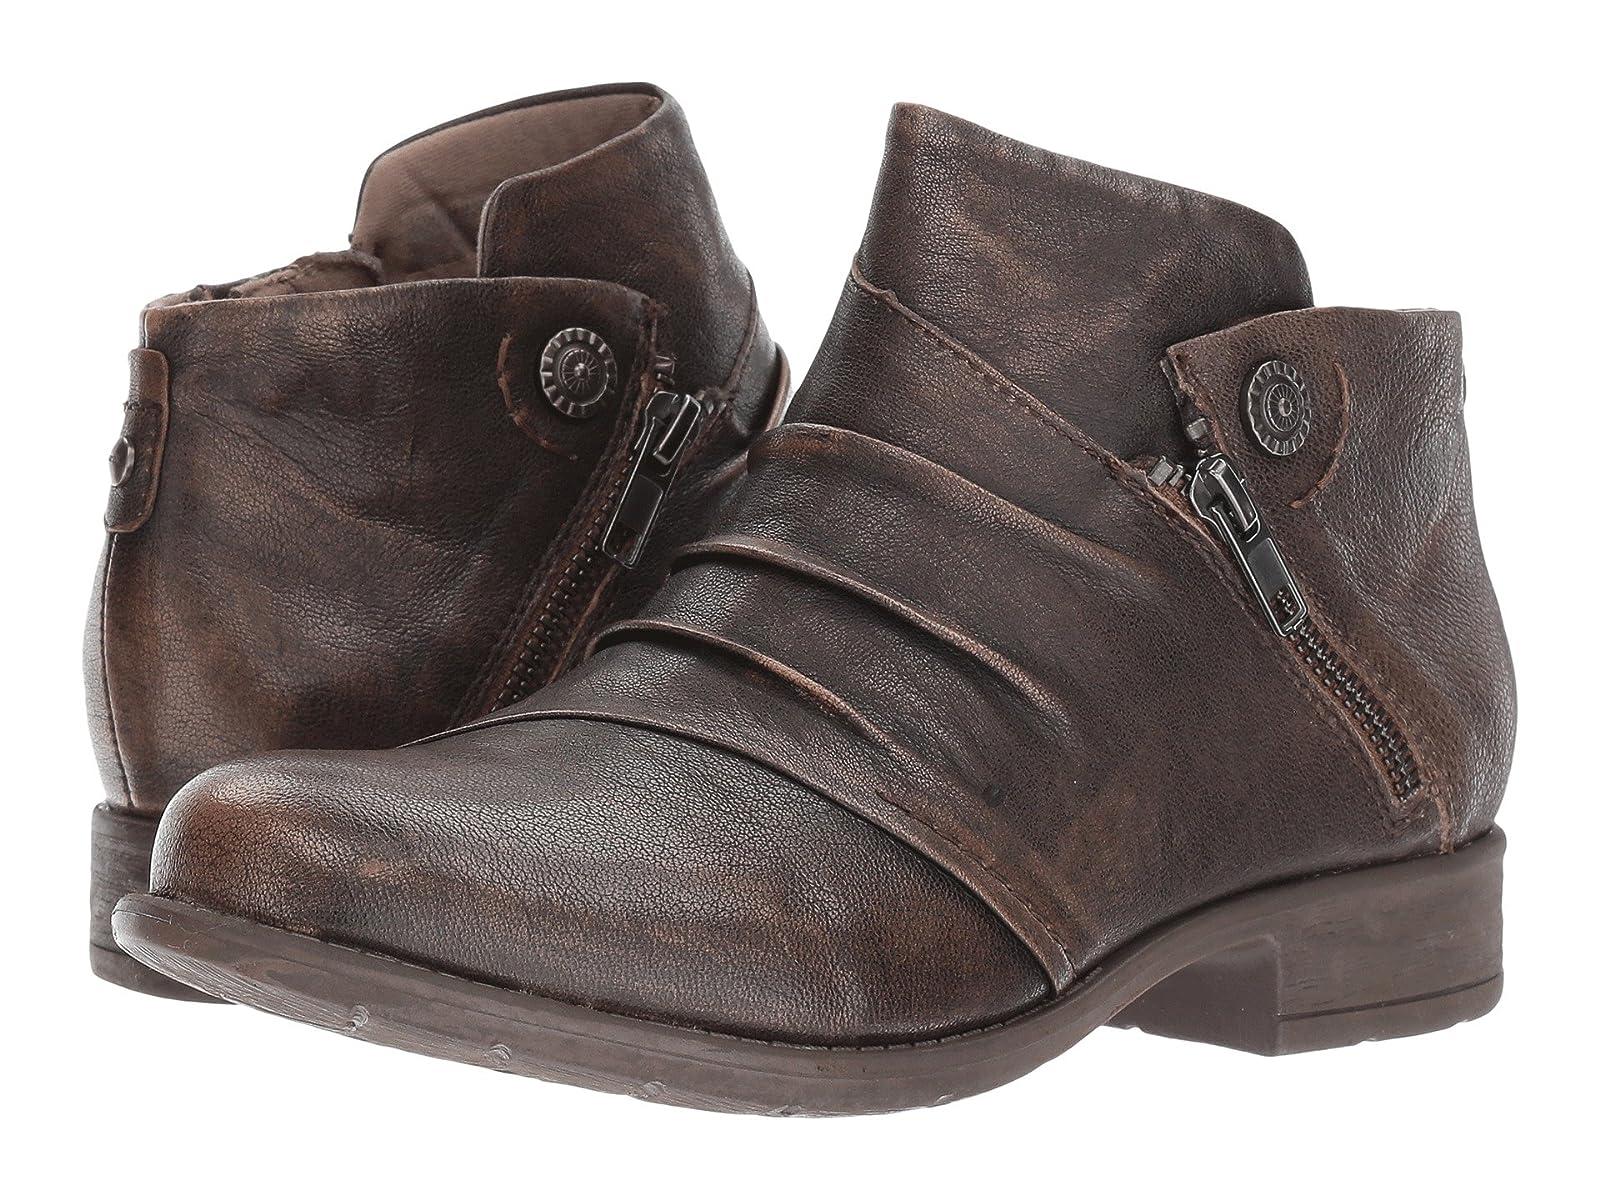 Earth RonanAffordable and distinctive shoes